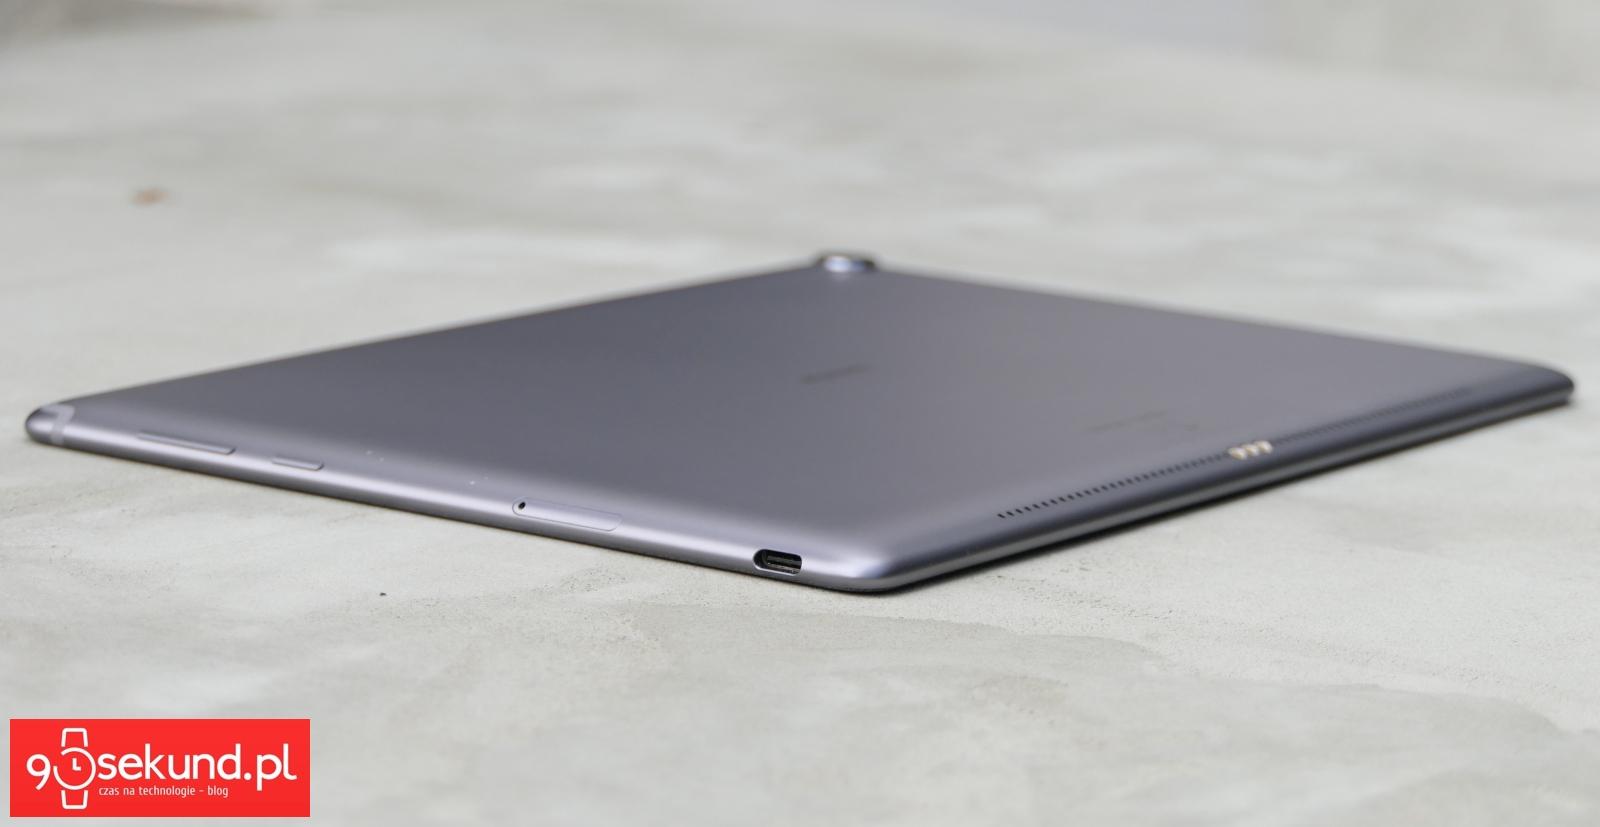 Recenzja tabletu Huawei MediaPad M5 (CMR-AL09) 10 cali - 90sekund.pl